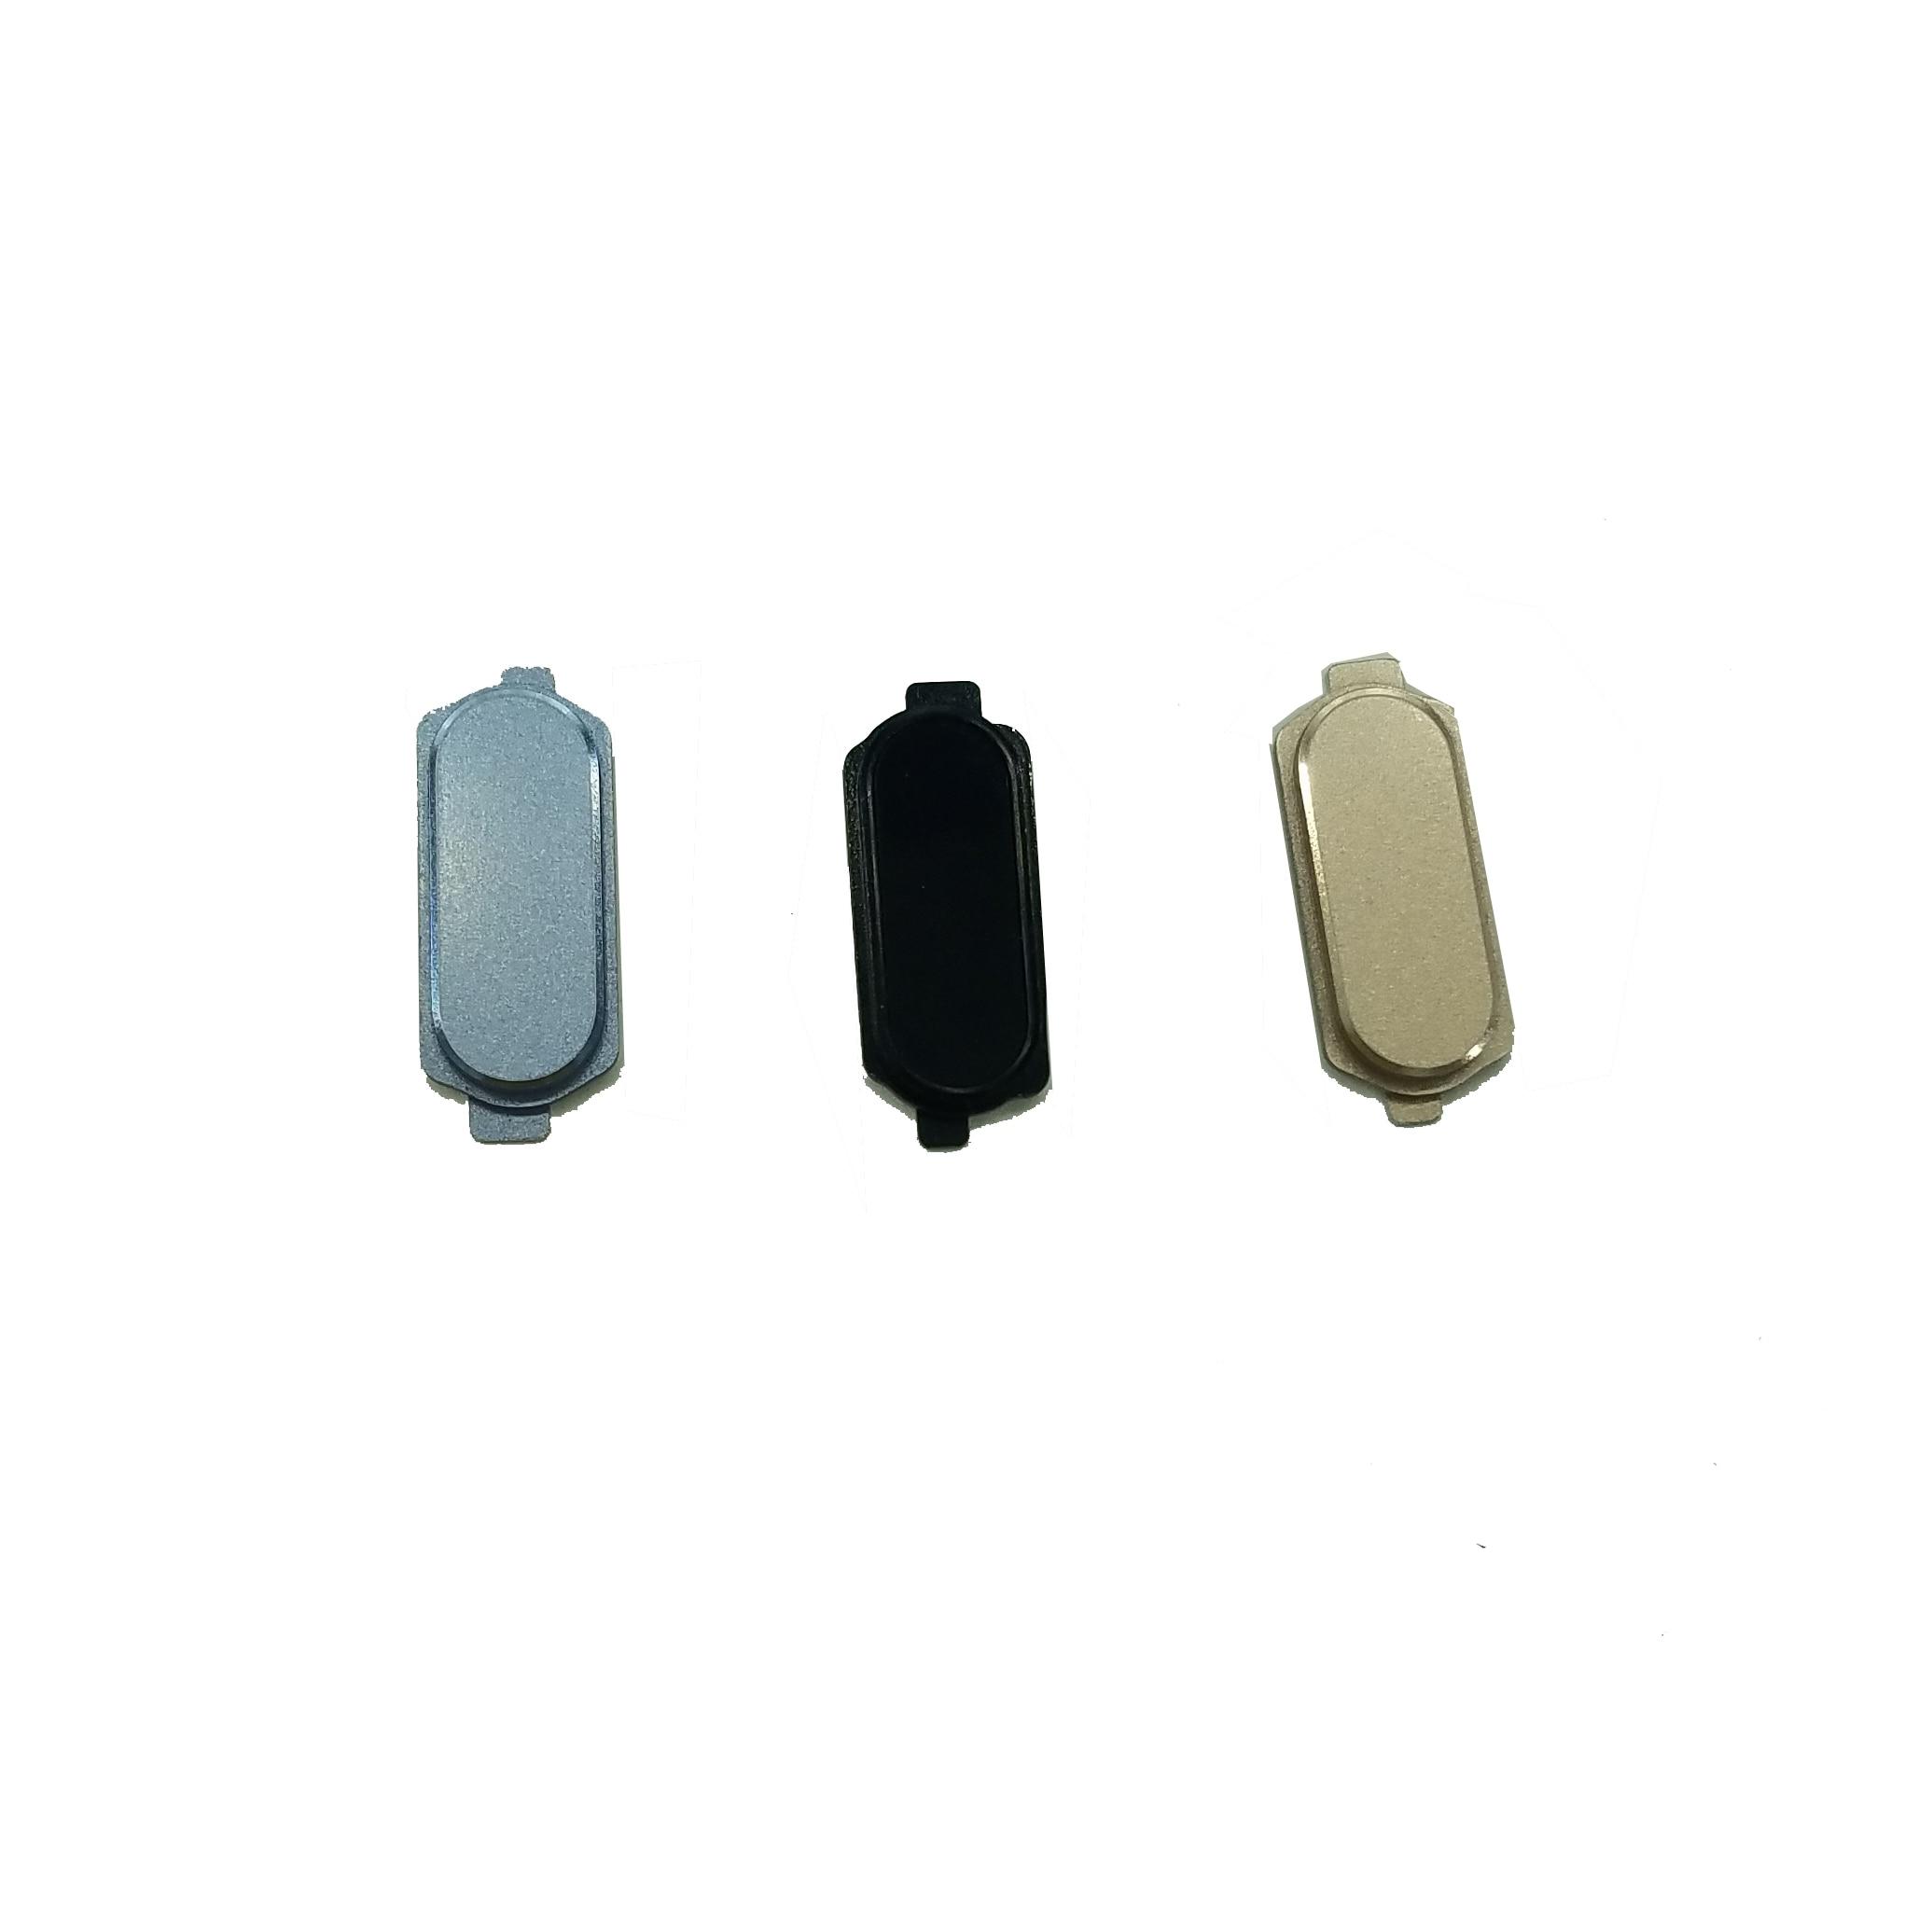 For Samsung Galaxy J3 Pro 2017 J330 J330F J330G J330FD Original Phone Flex Cable Housing New Home Button Menu Key Replacement